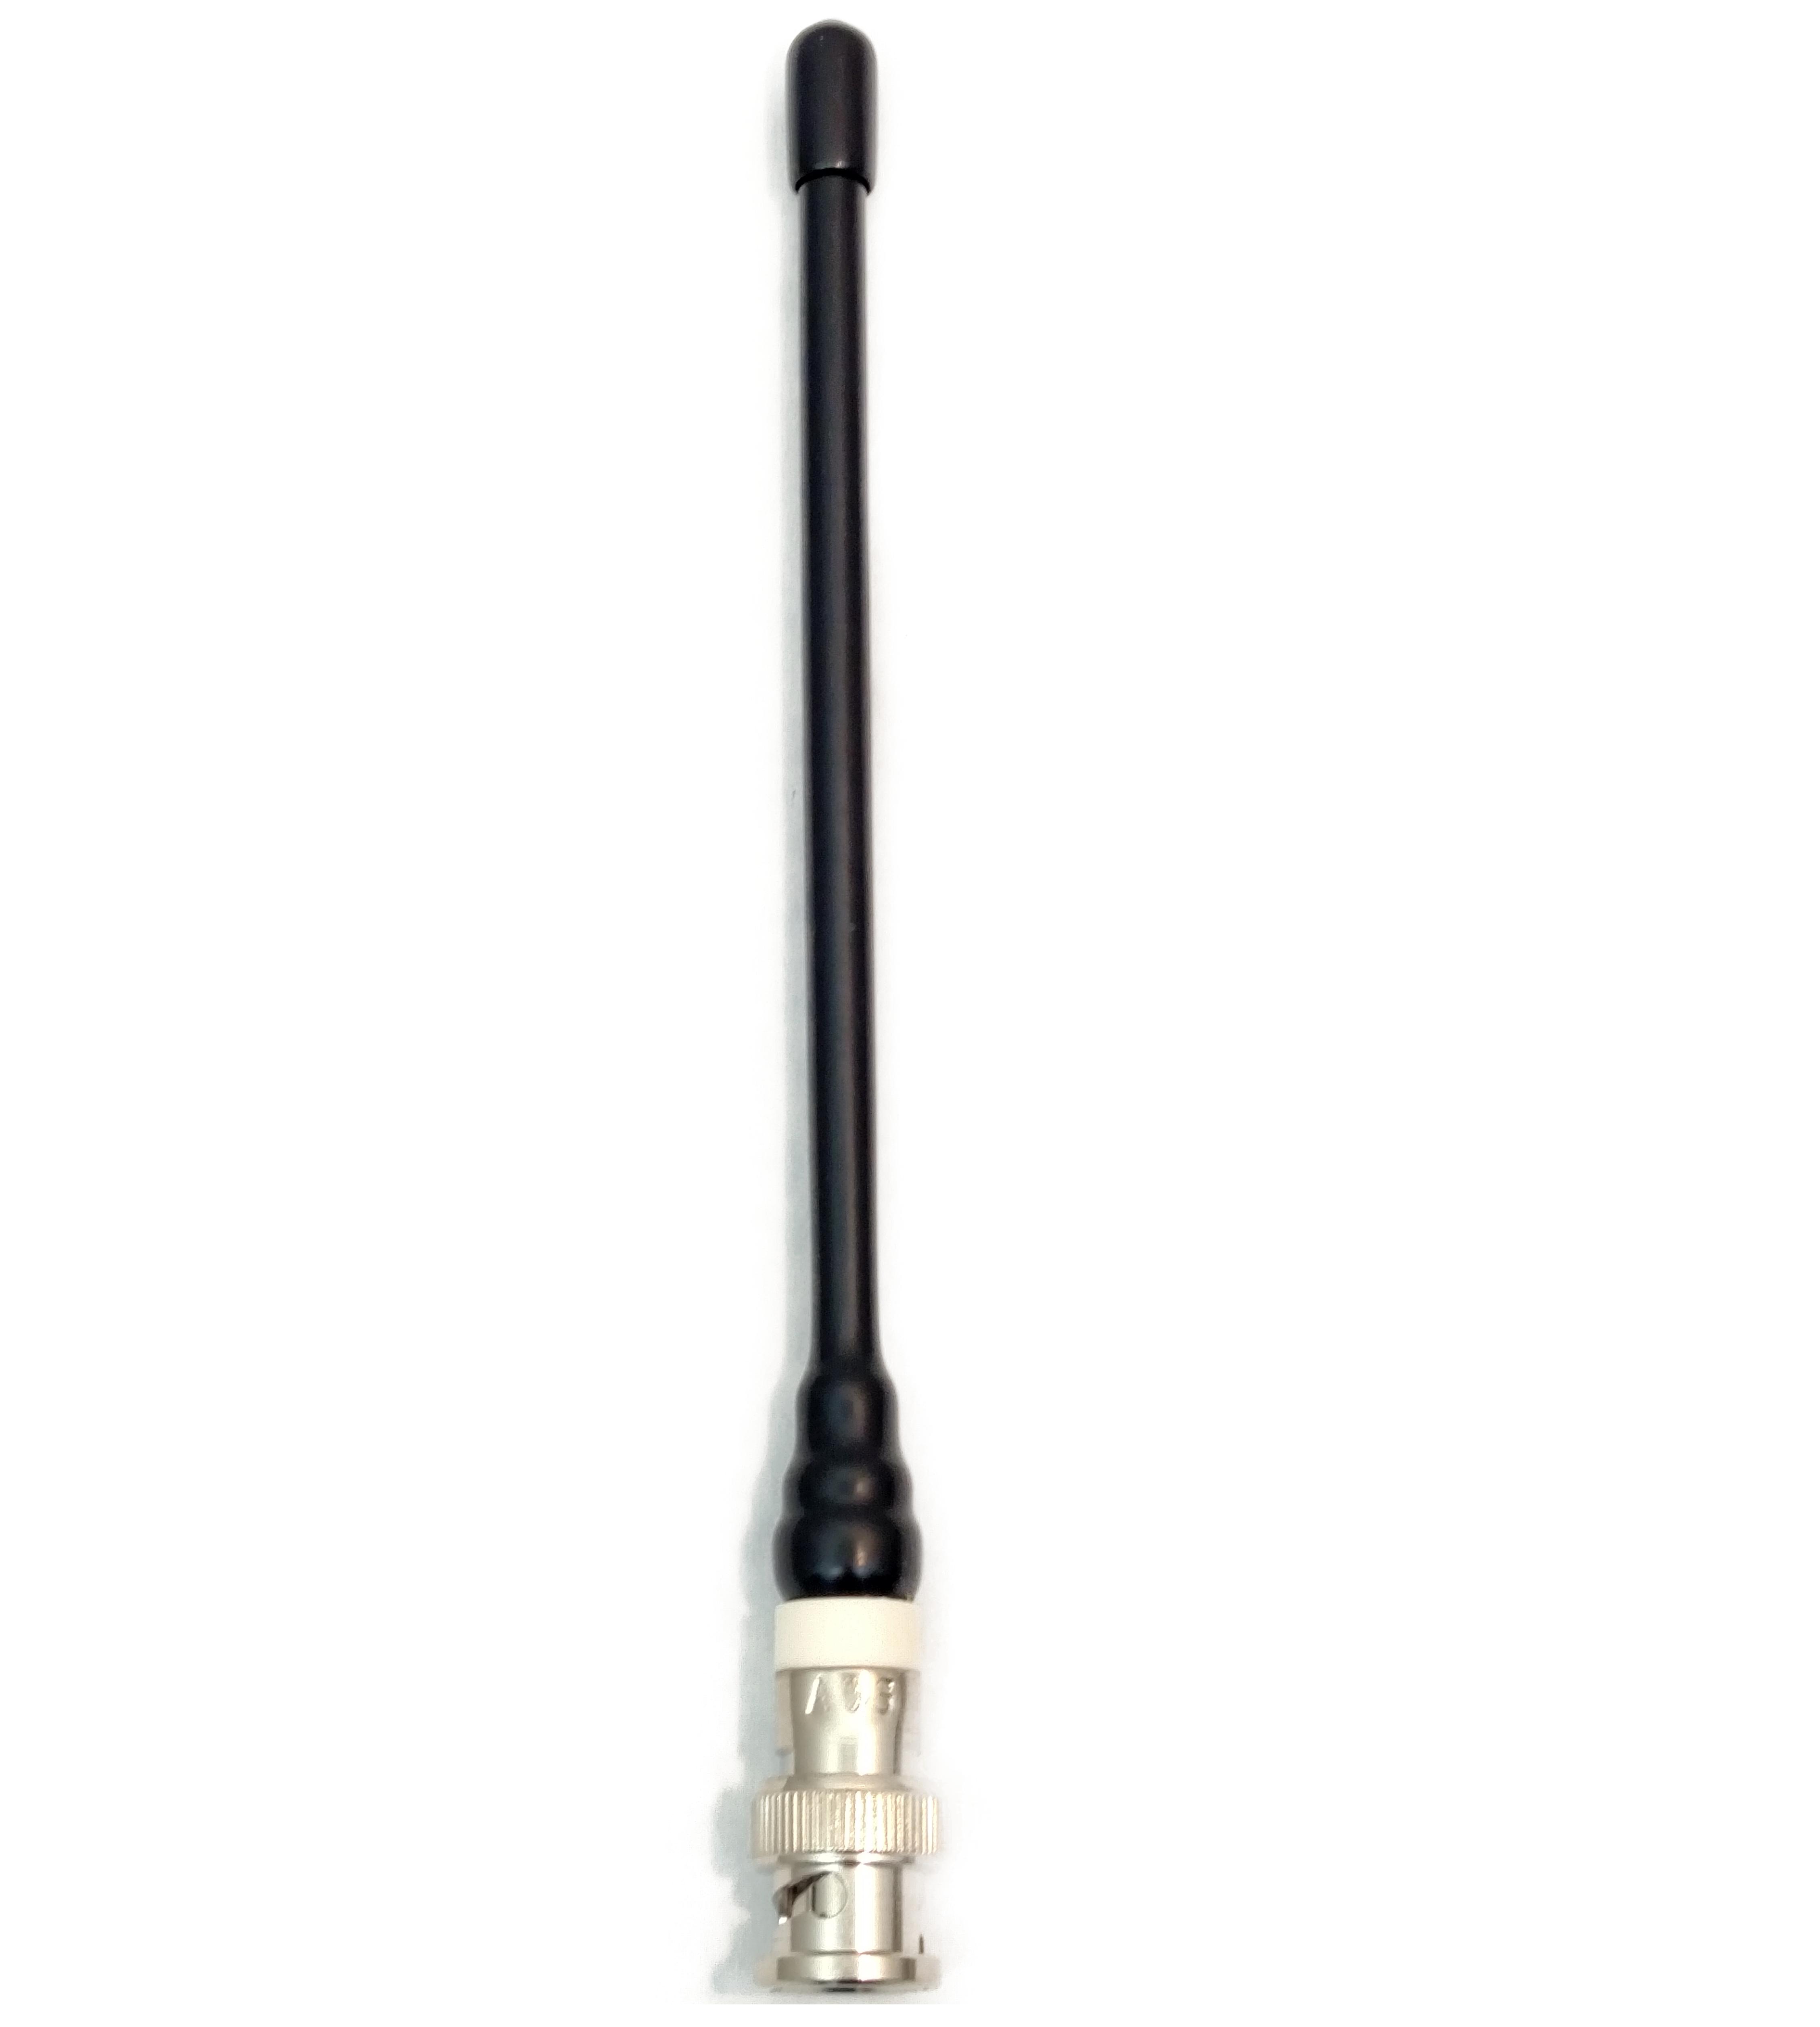 70A06C - Antenna Specialists 470-512 MHz Antenna C470Bn